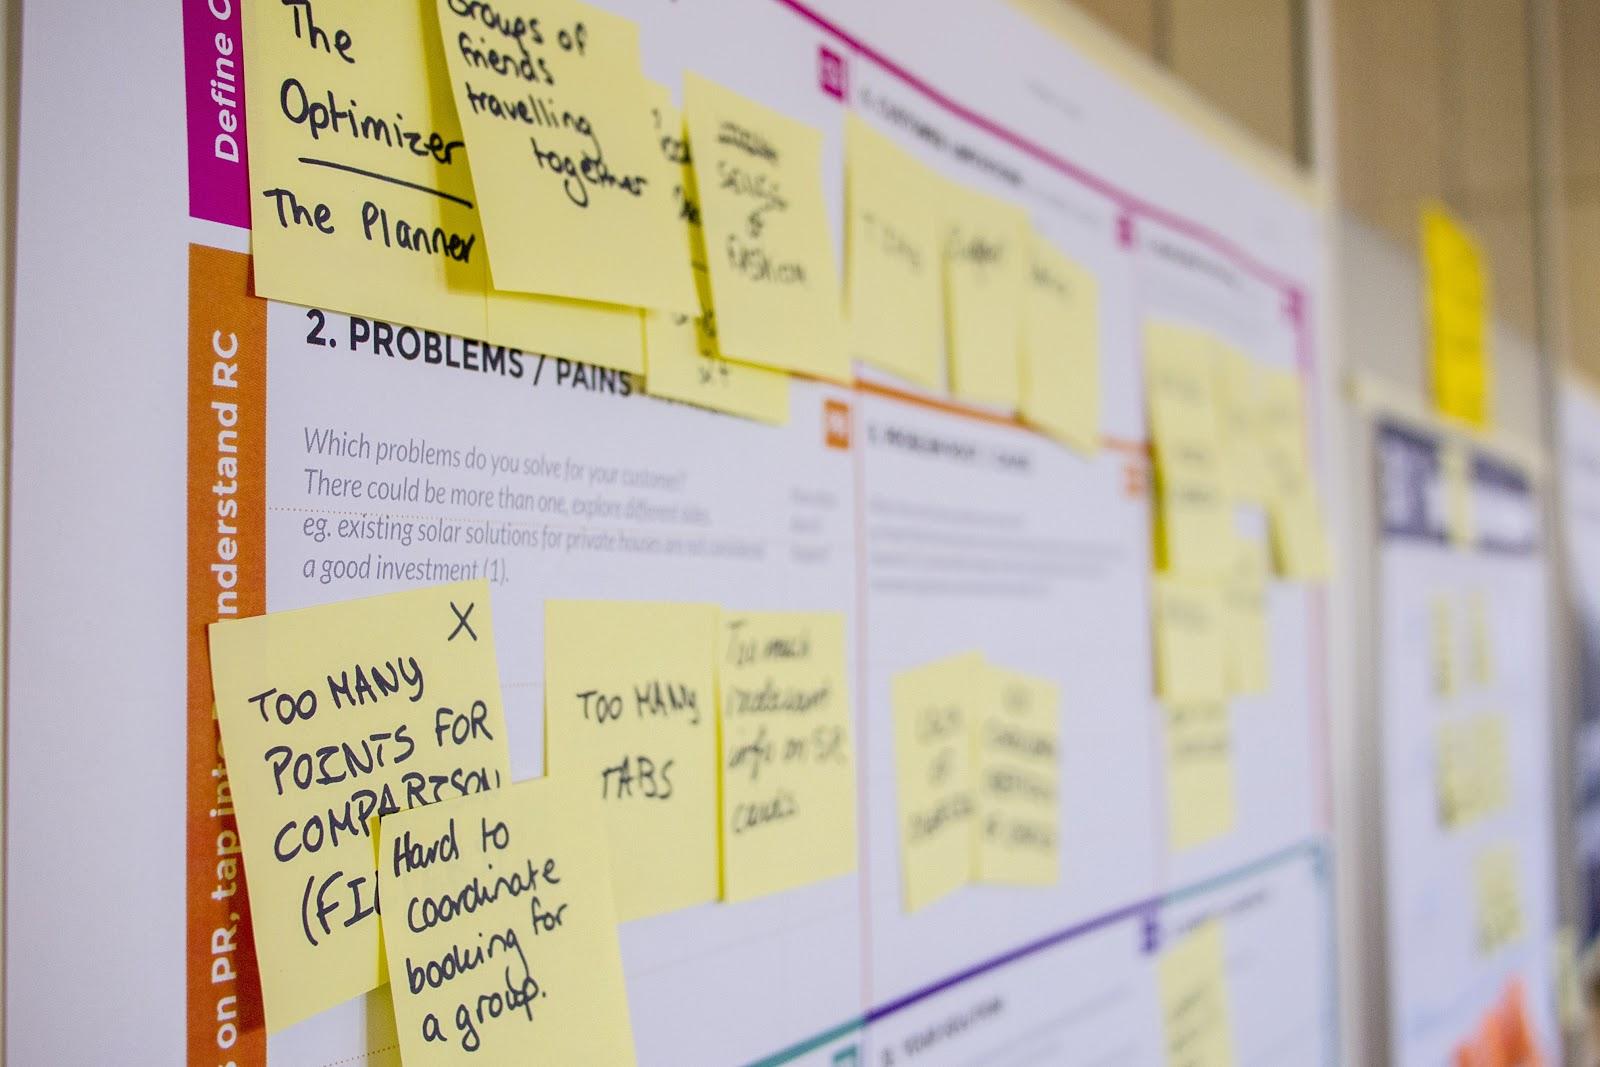 How to Brainstorm Blog Topics That Will Grow Organic Traffic